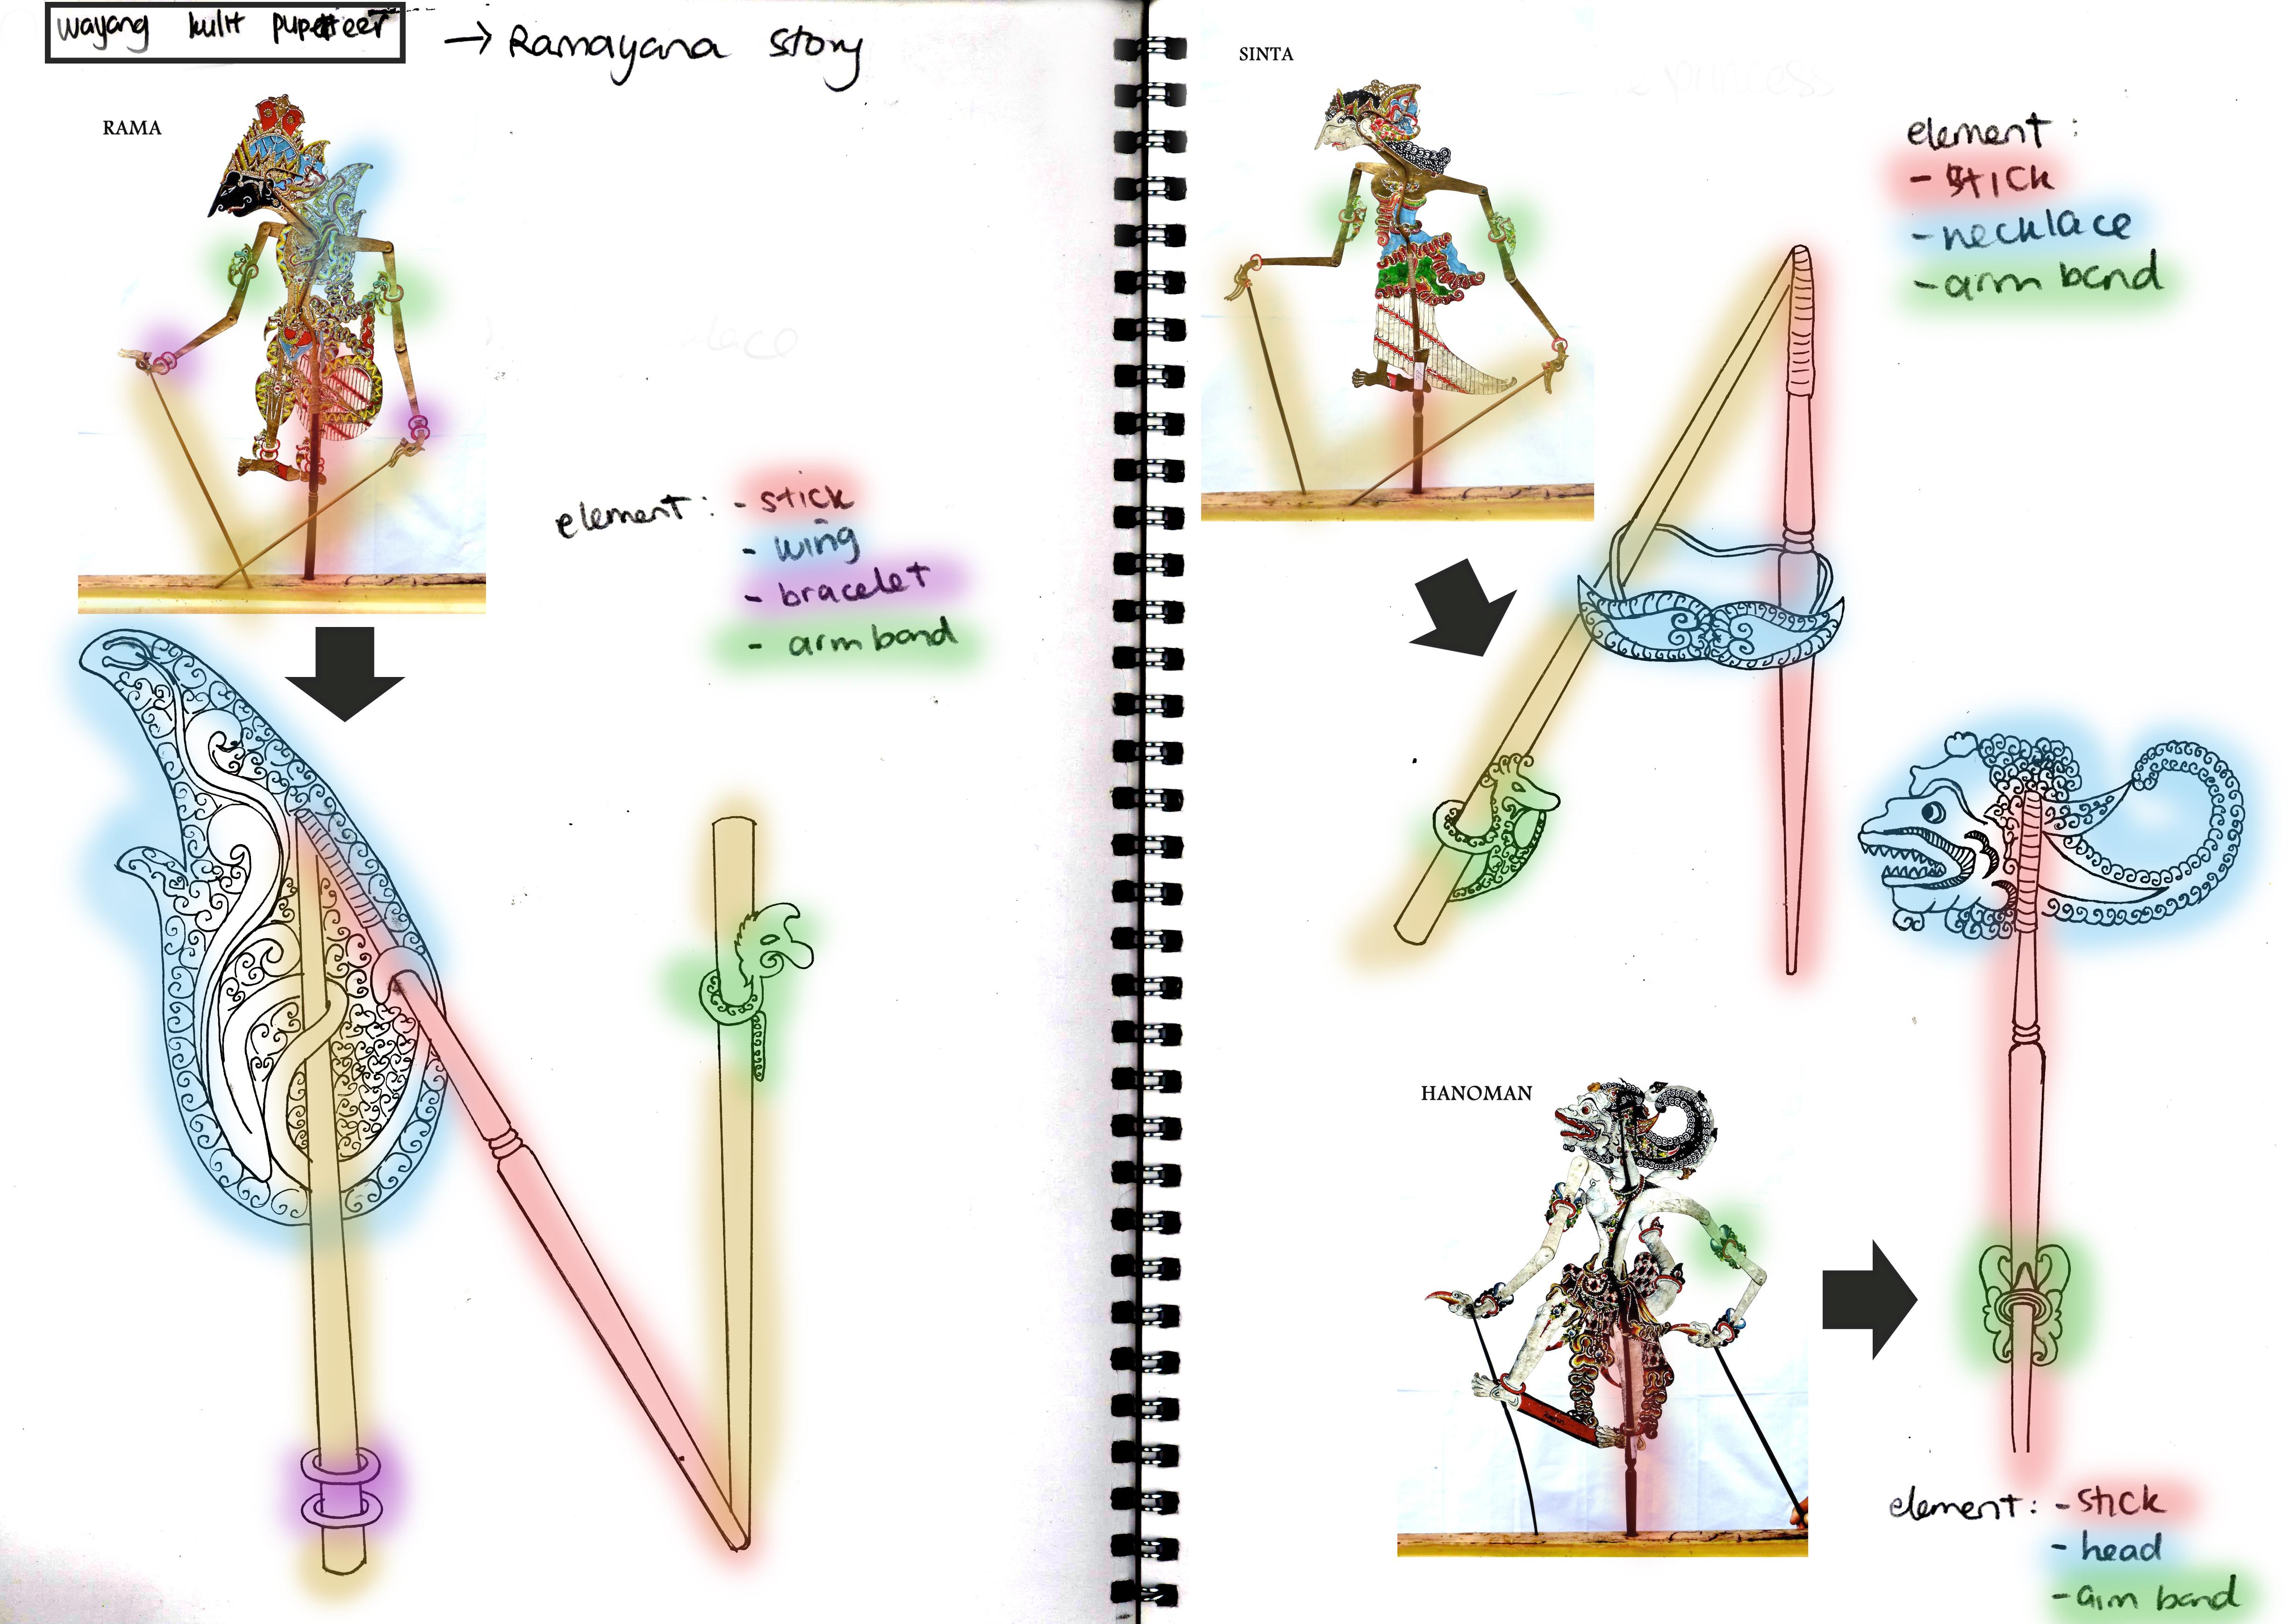 Shadow puppet characterization